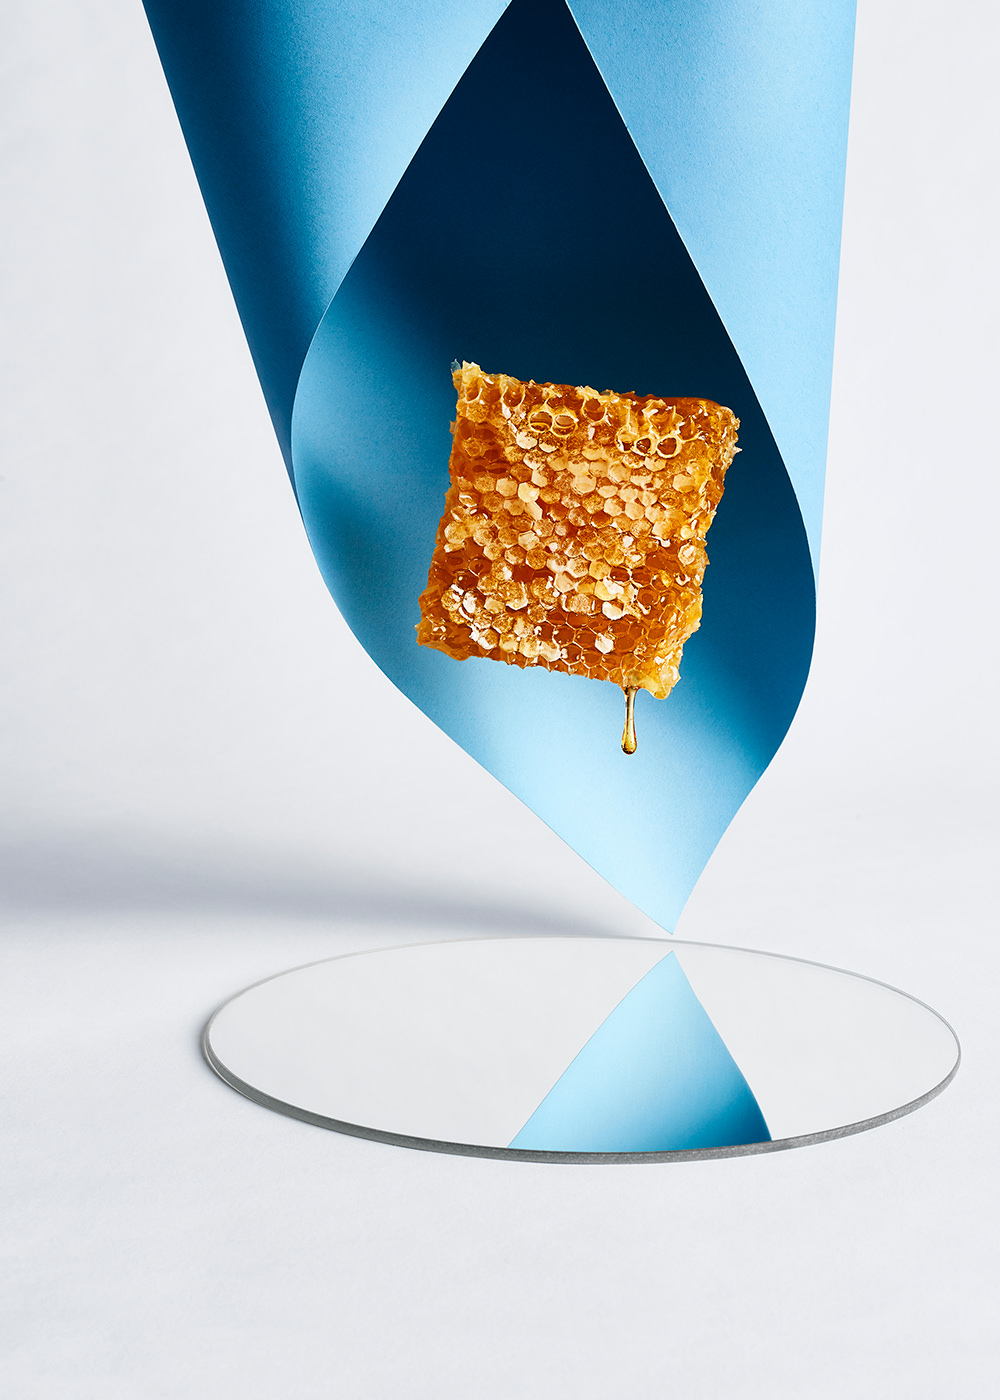 dripping honeycomb conceptual still life shot by camilo mateus